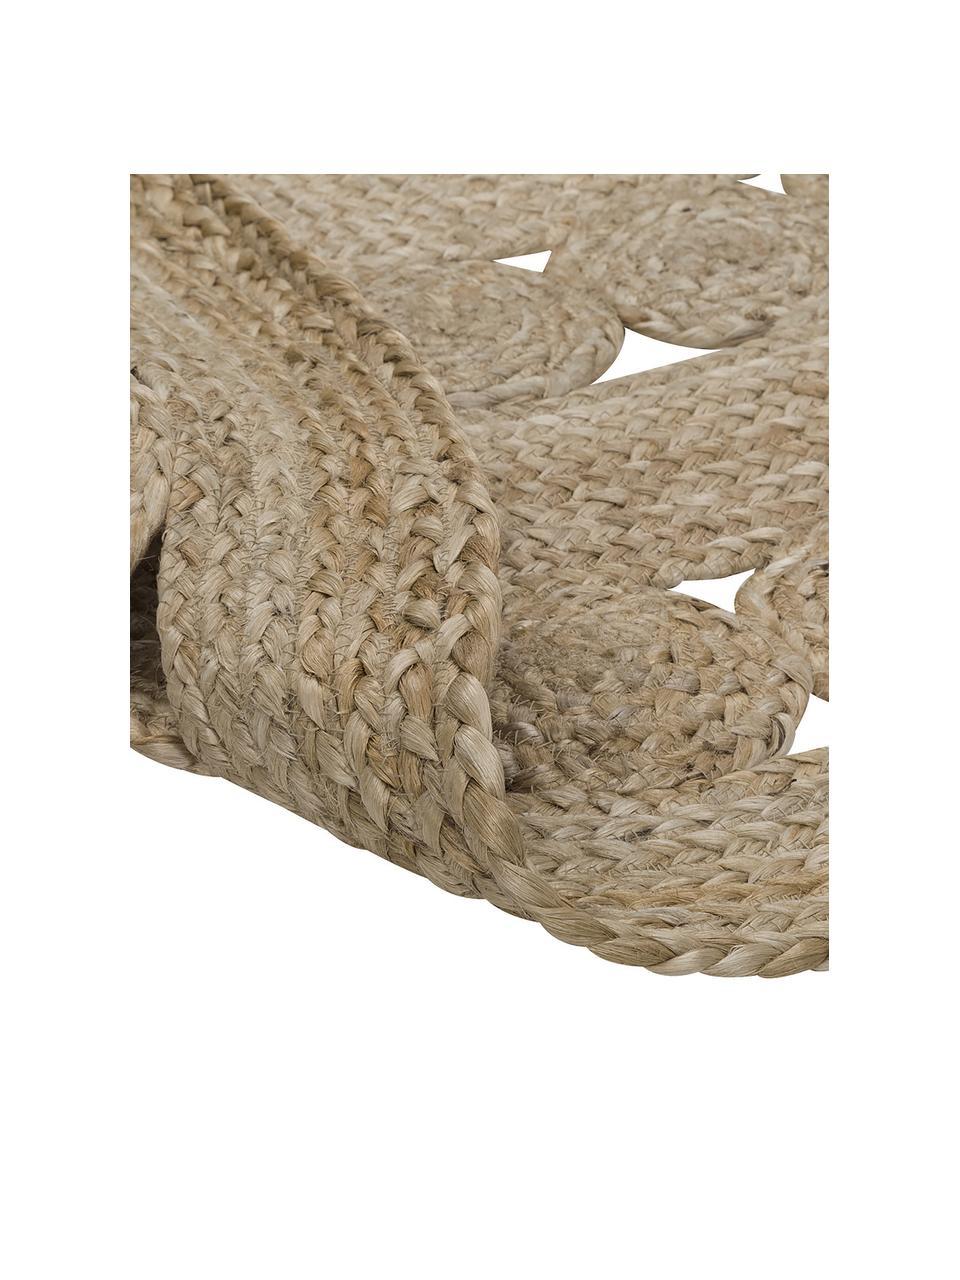 Runder Jute-Teppich Shyam im Boho Style, handgefertigt, 100% Jute, Jute, Ø 150 cm (Größe M)